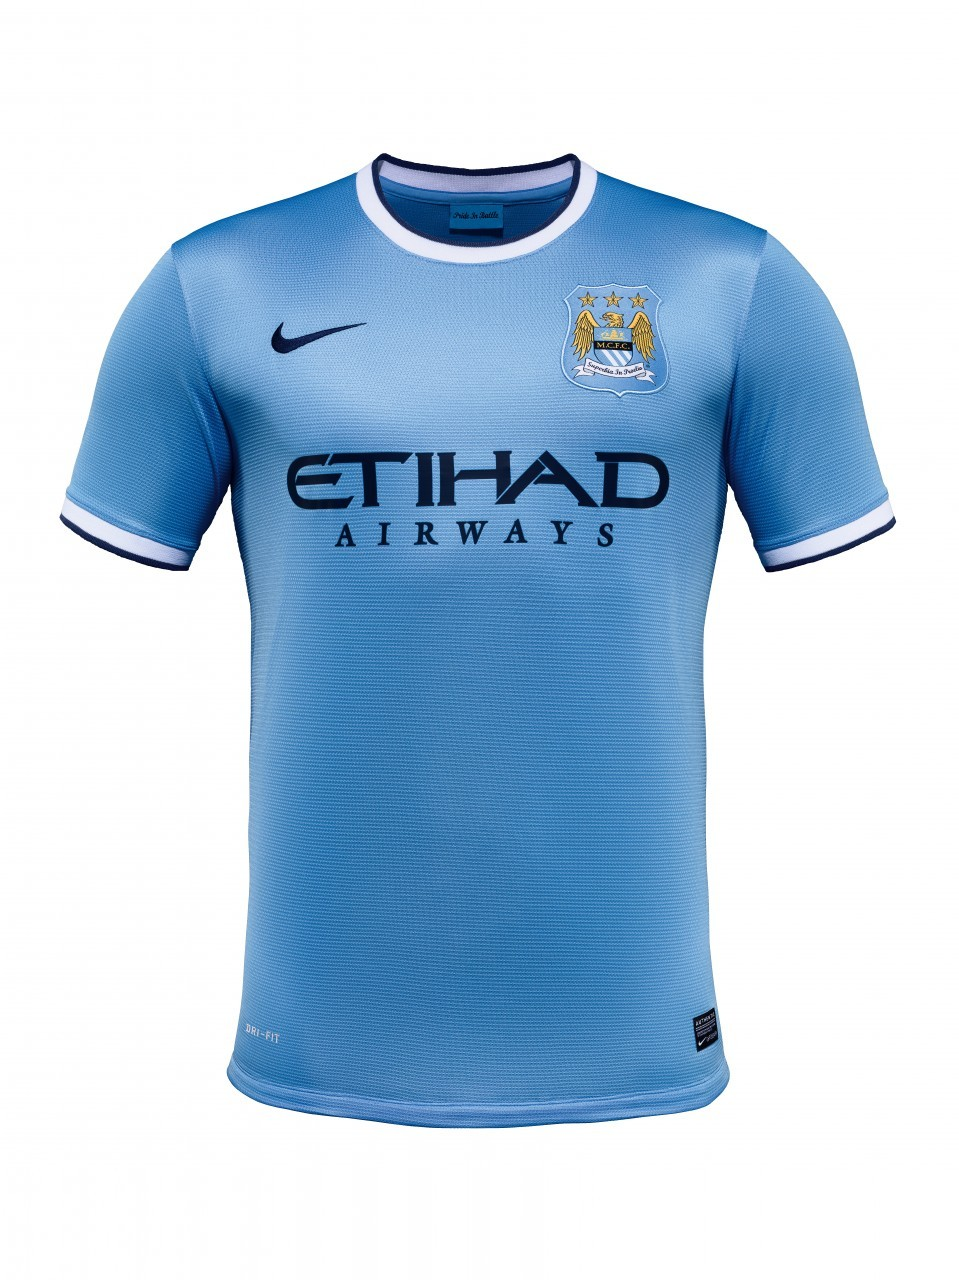 Jersey Manchester City Home - Kaos Bola Murah